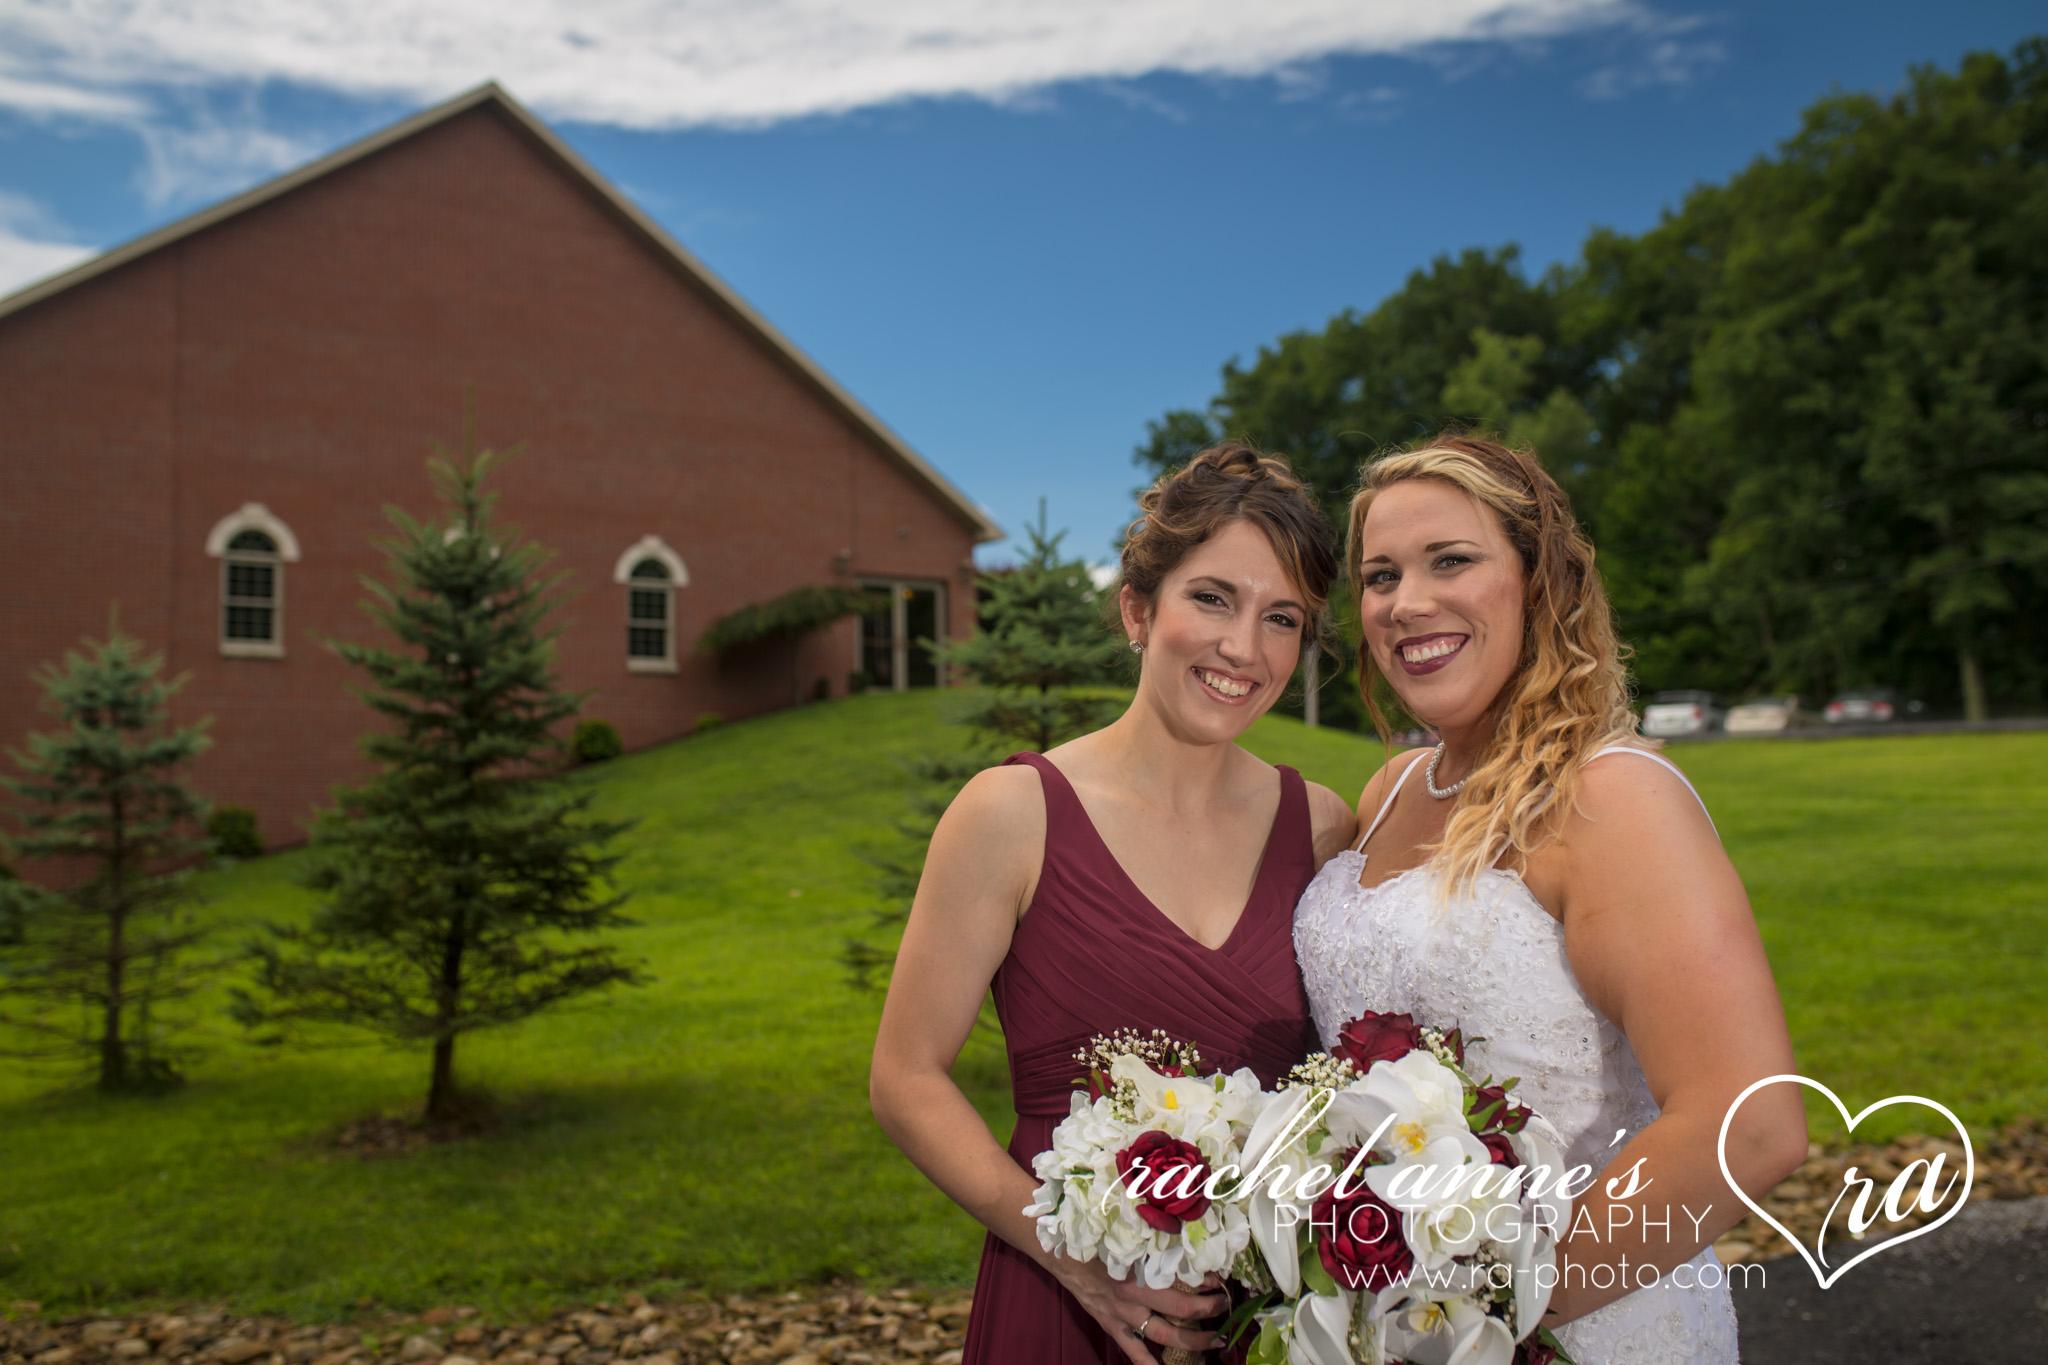 011-MAB-TREASURE-LAKE-CHURCH-LODGE-PA-WEDDINGS.jpg